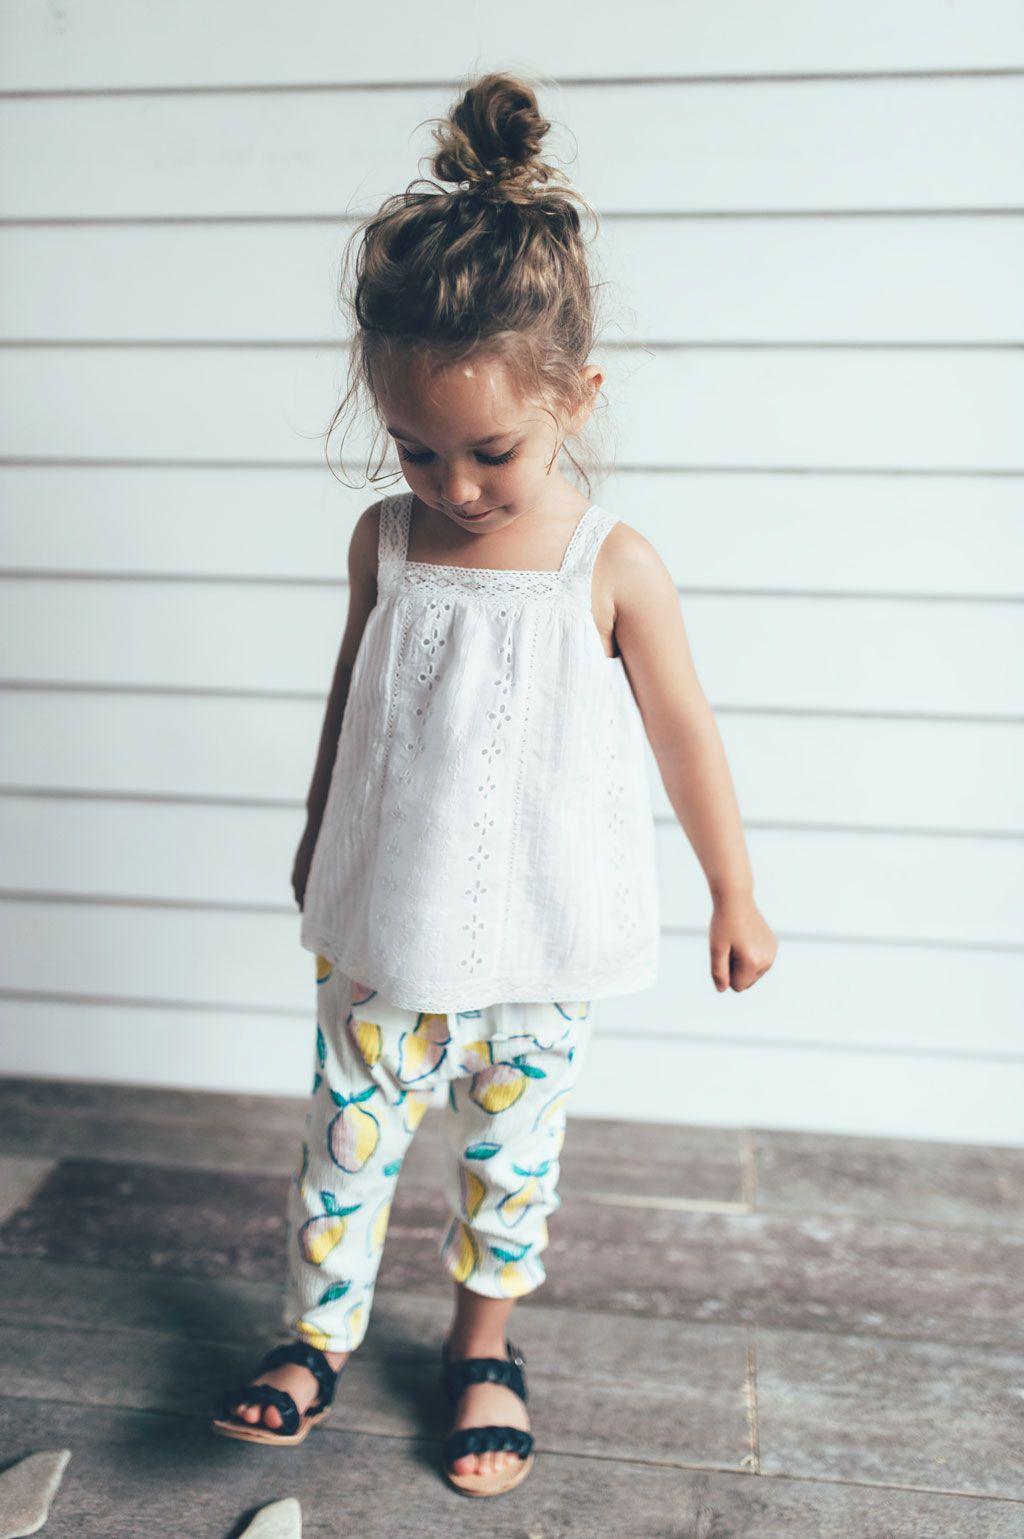 c86bd0bf3c144 SUMMER COLLECTION   BABY GIRL-KIDS-EDITORIALS   ZARA United States ...